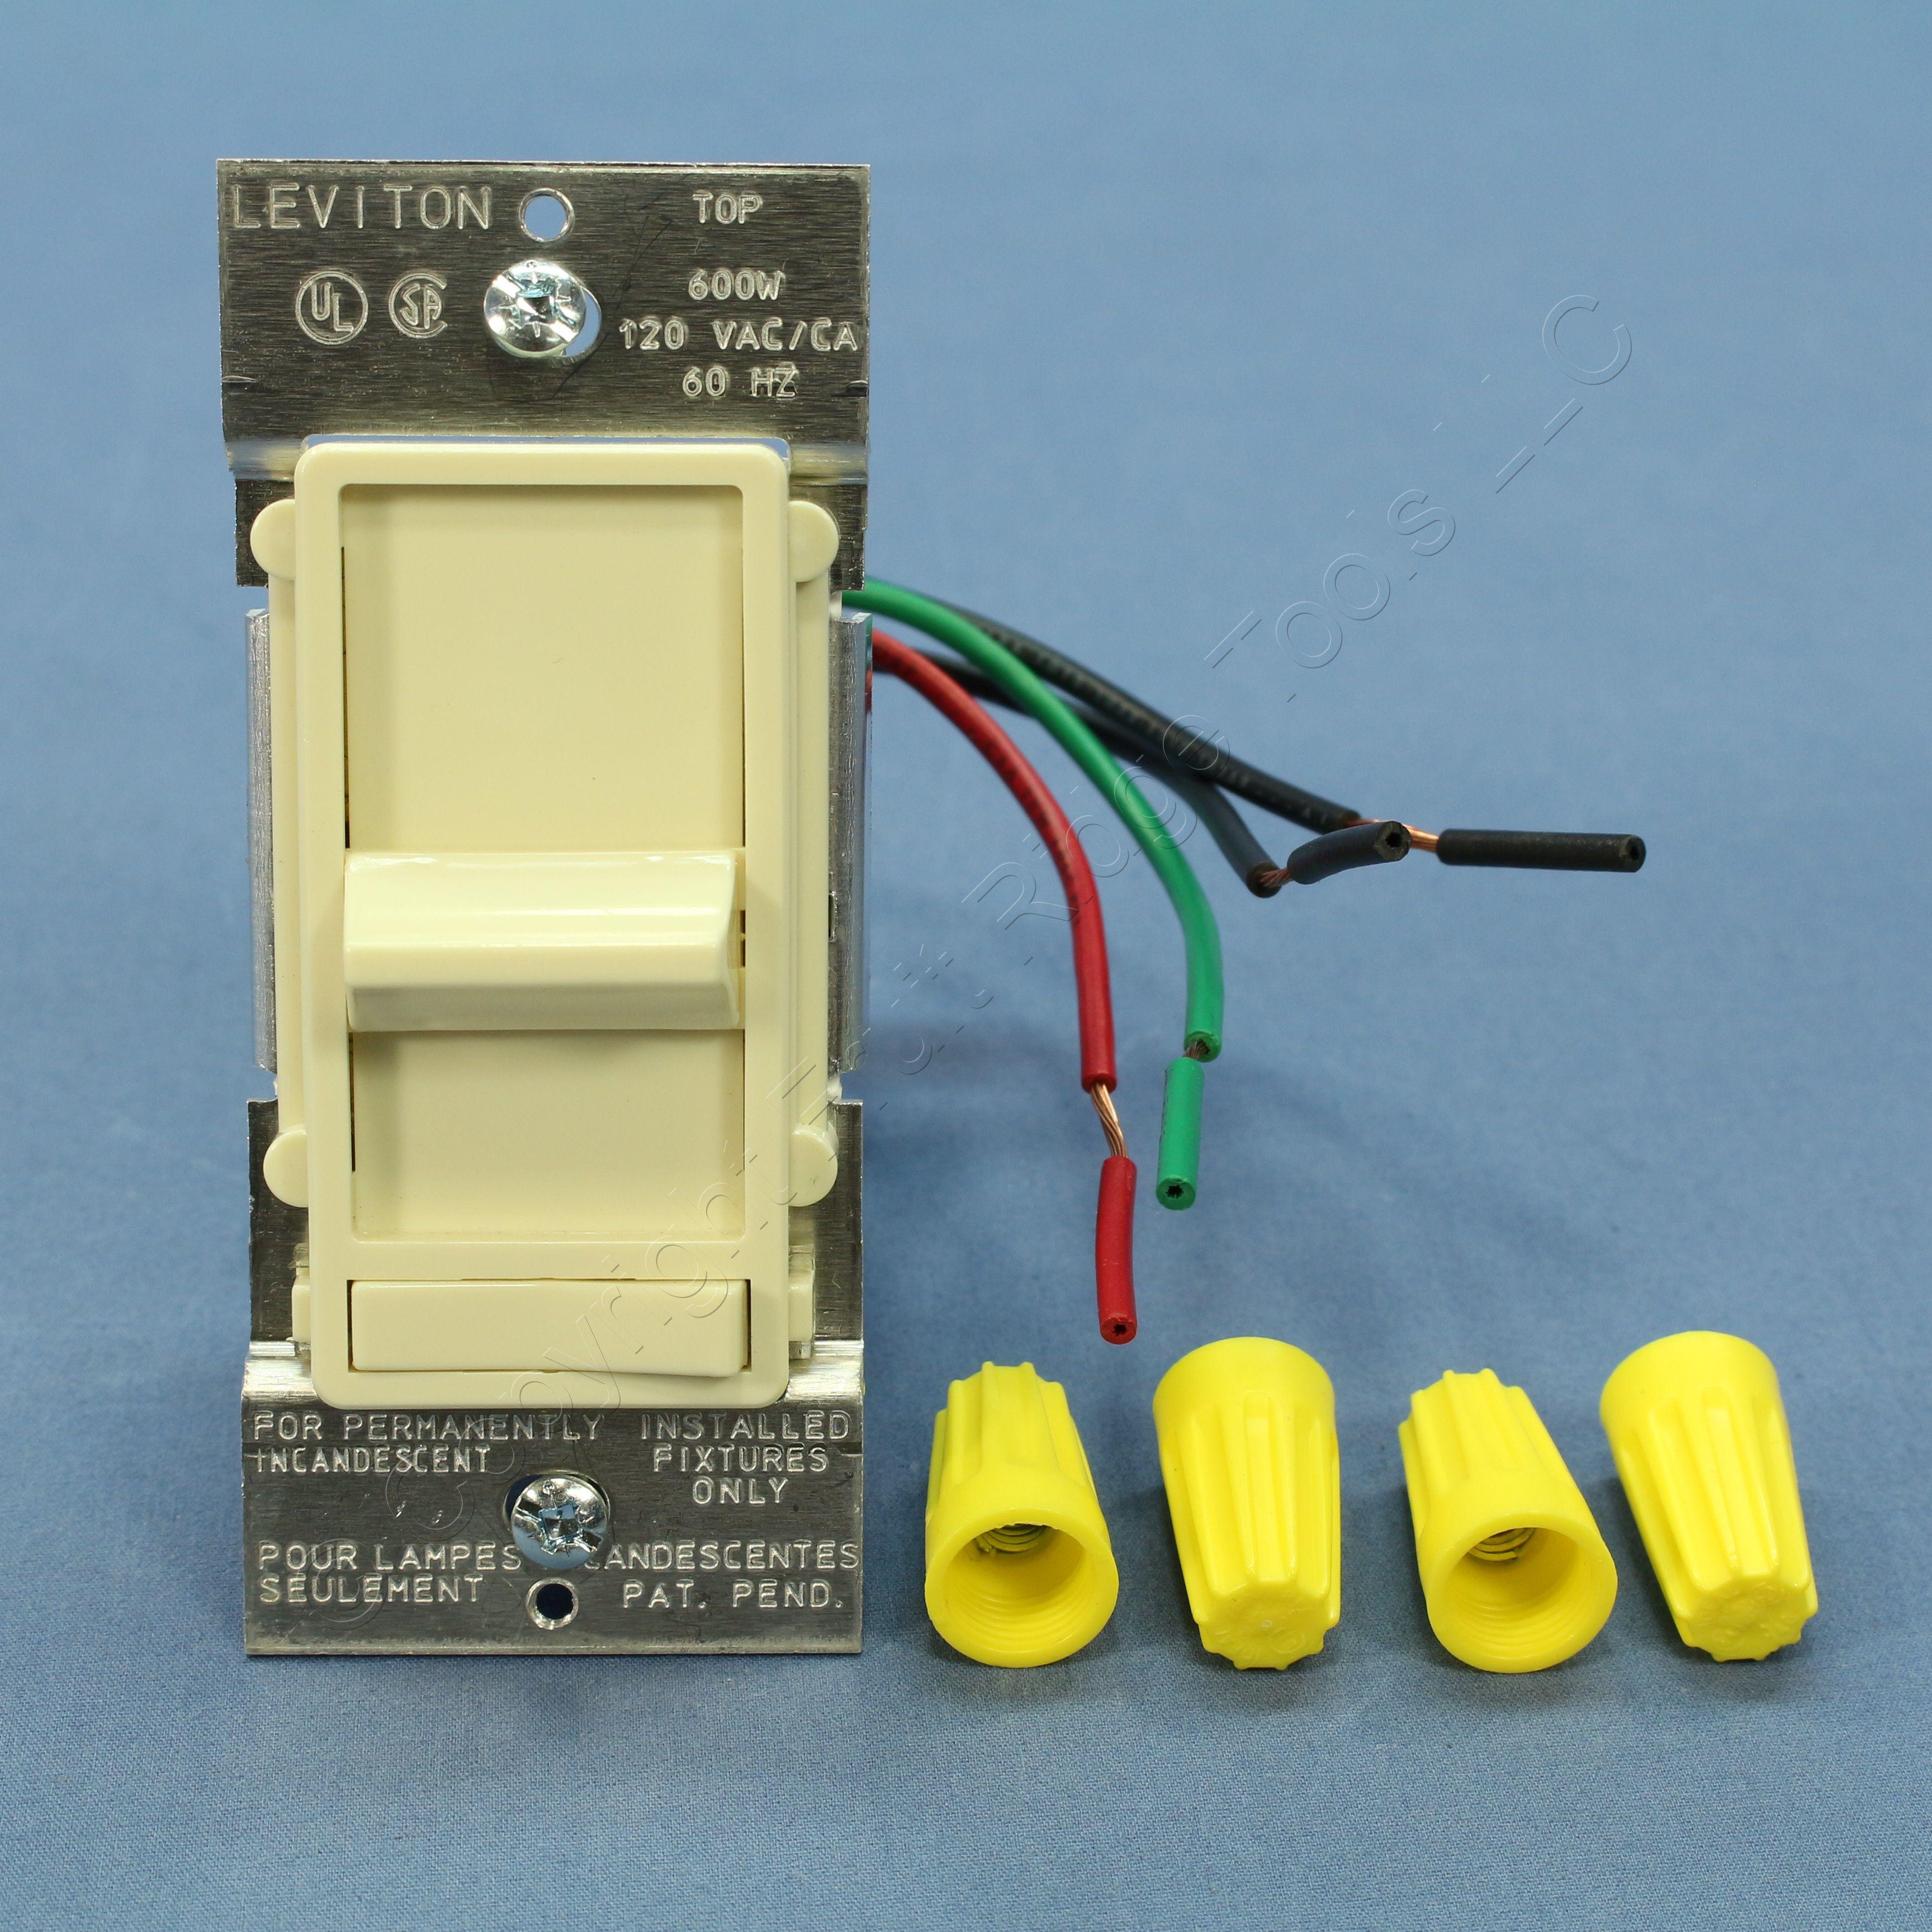 Wiring Diagram Leviton Decora Light Dimmer Switch Free Download ...